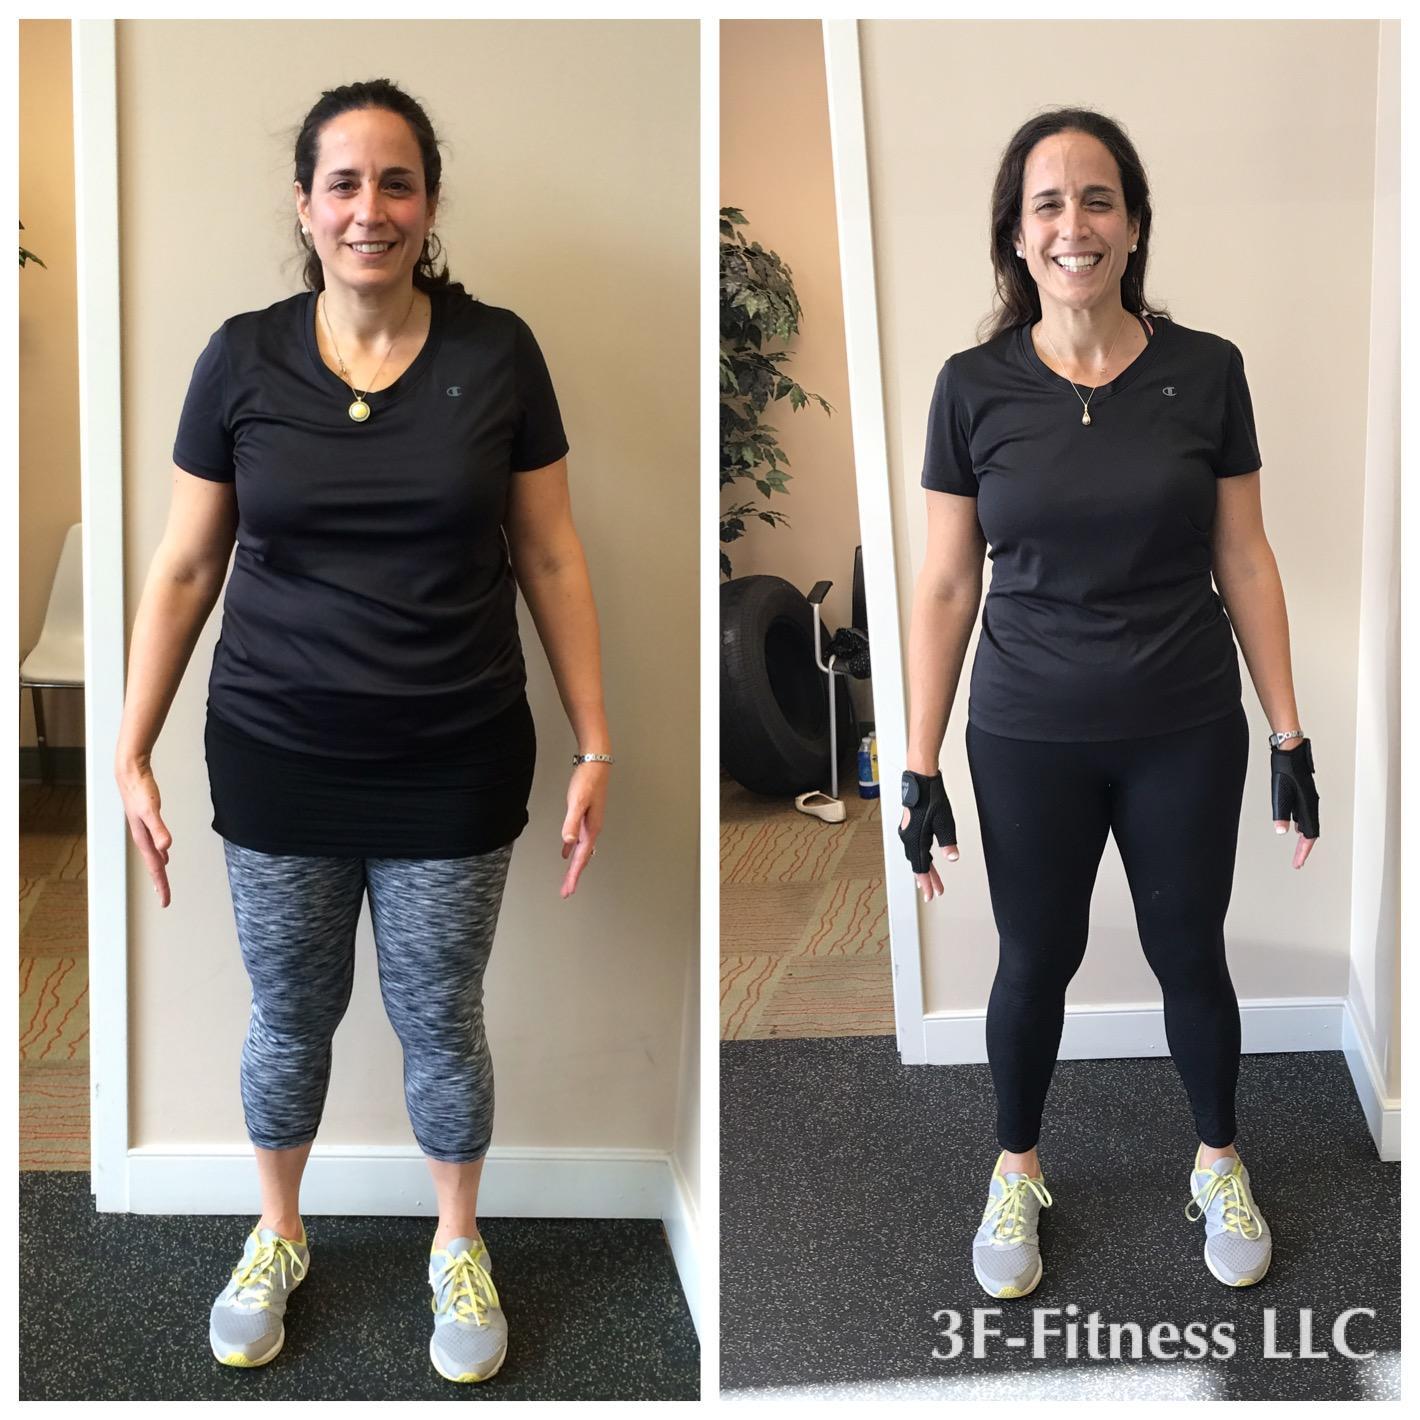 3F-Fitness LLC image 5